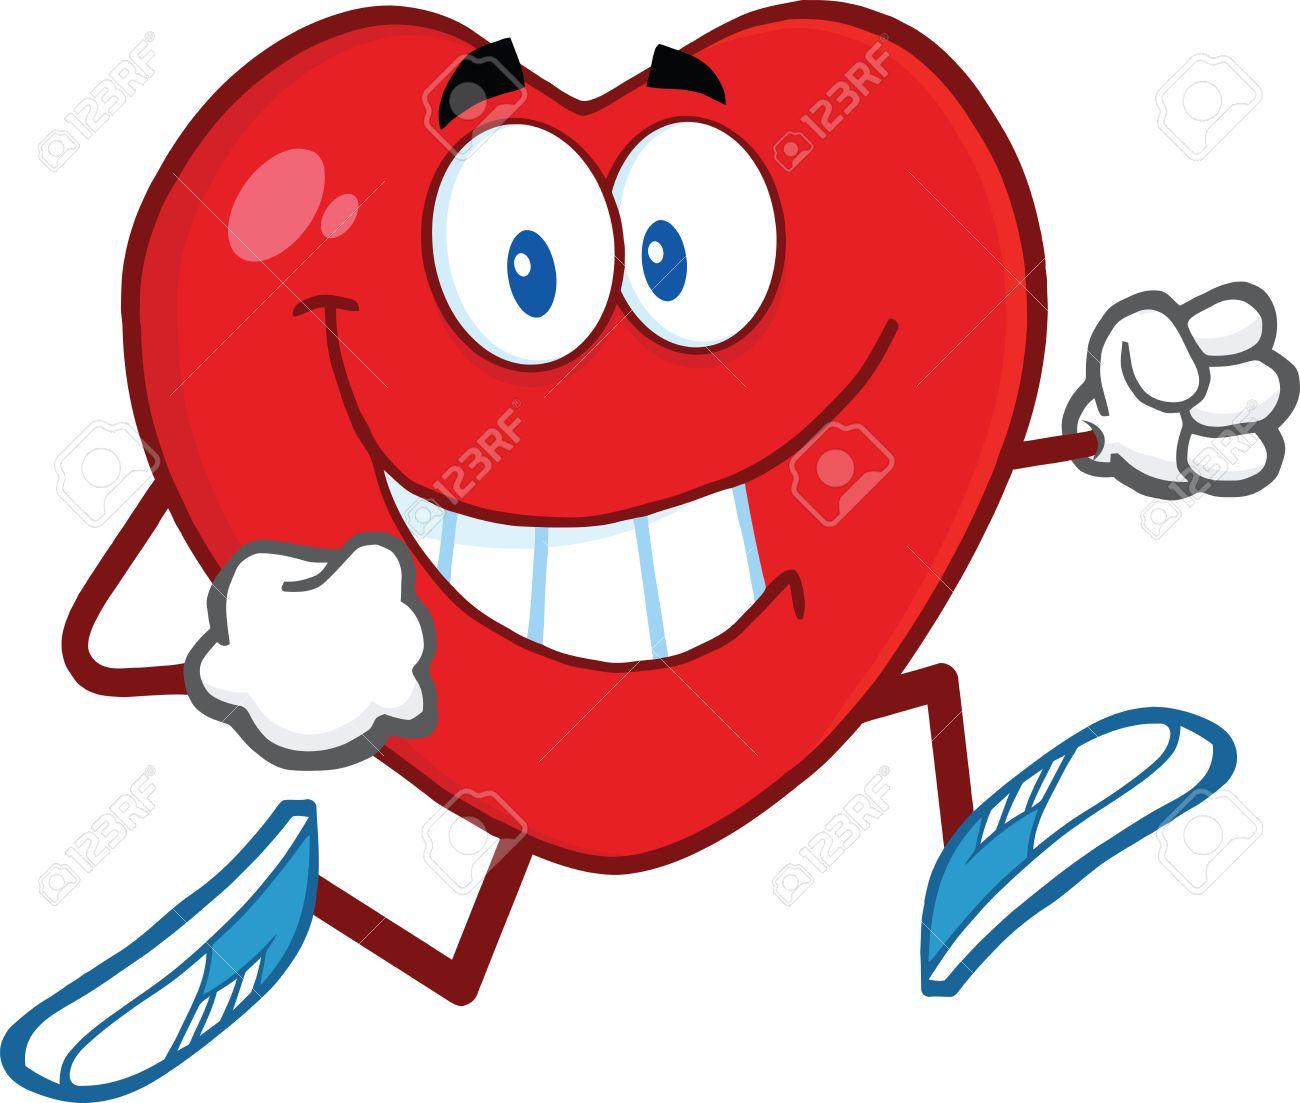 1300x1103 Smiling Heart Cartoon Mascot Character Running Illustration